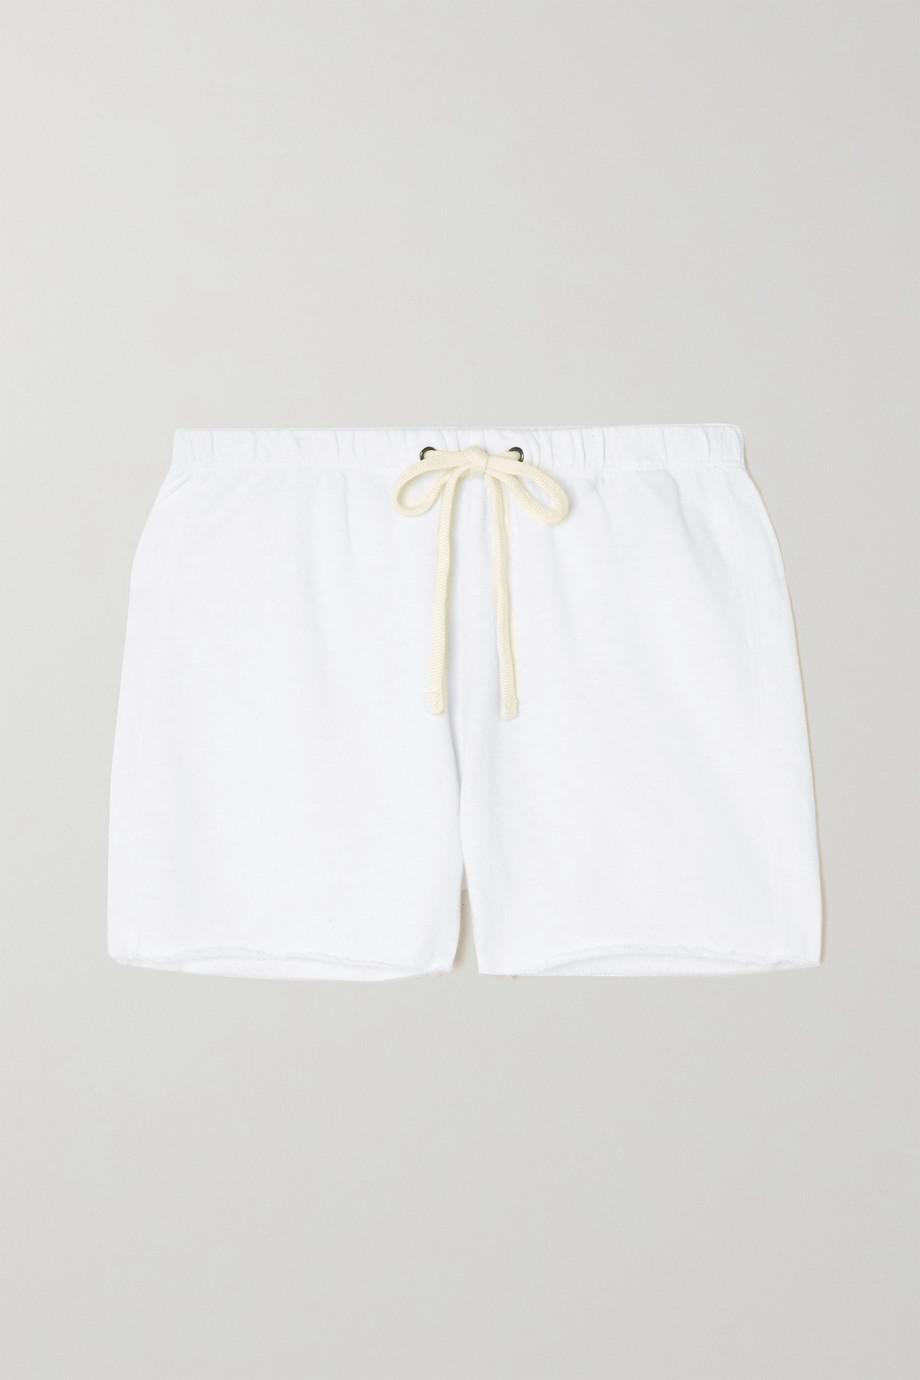 James Perse Supima cotton-jersey shorts